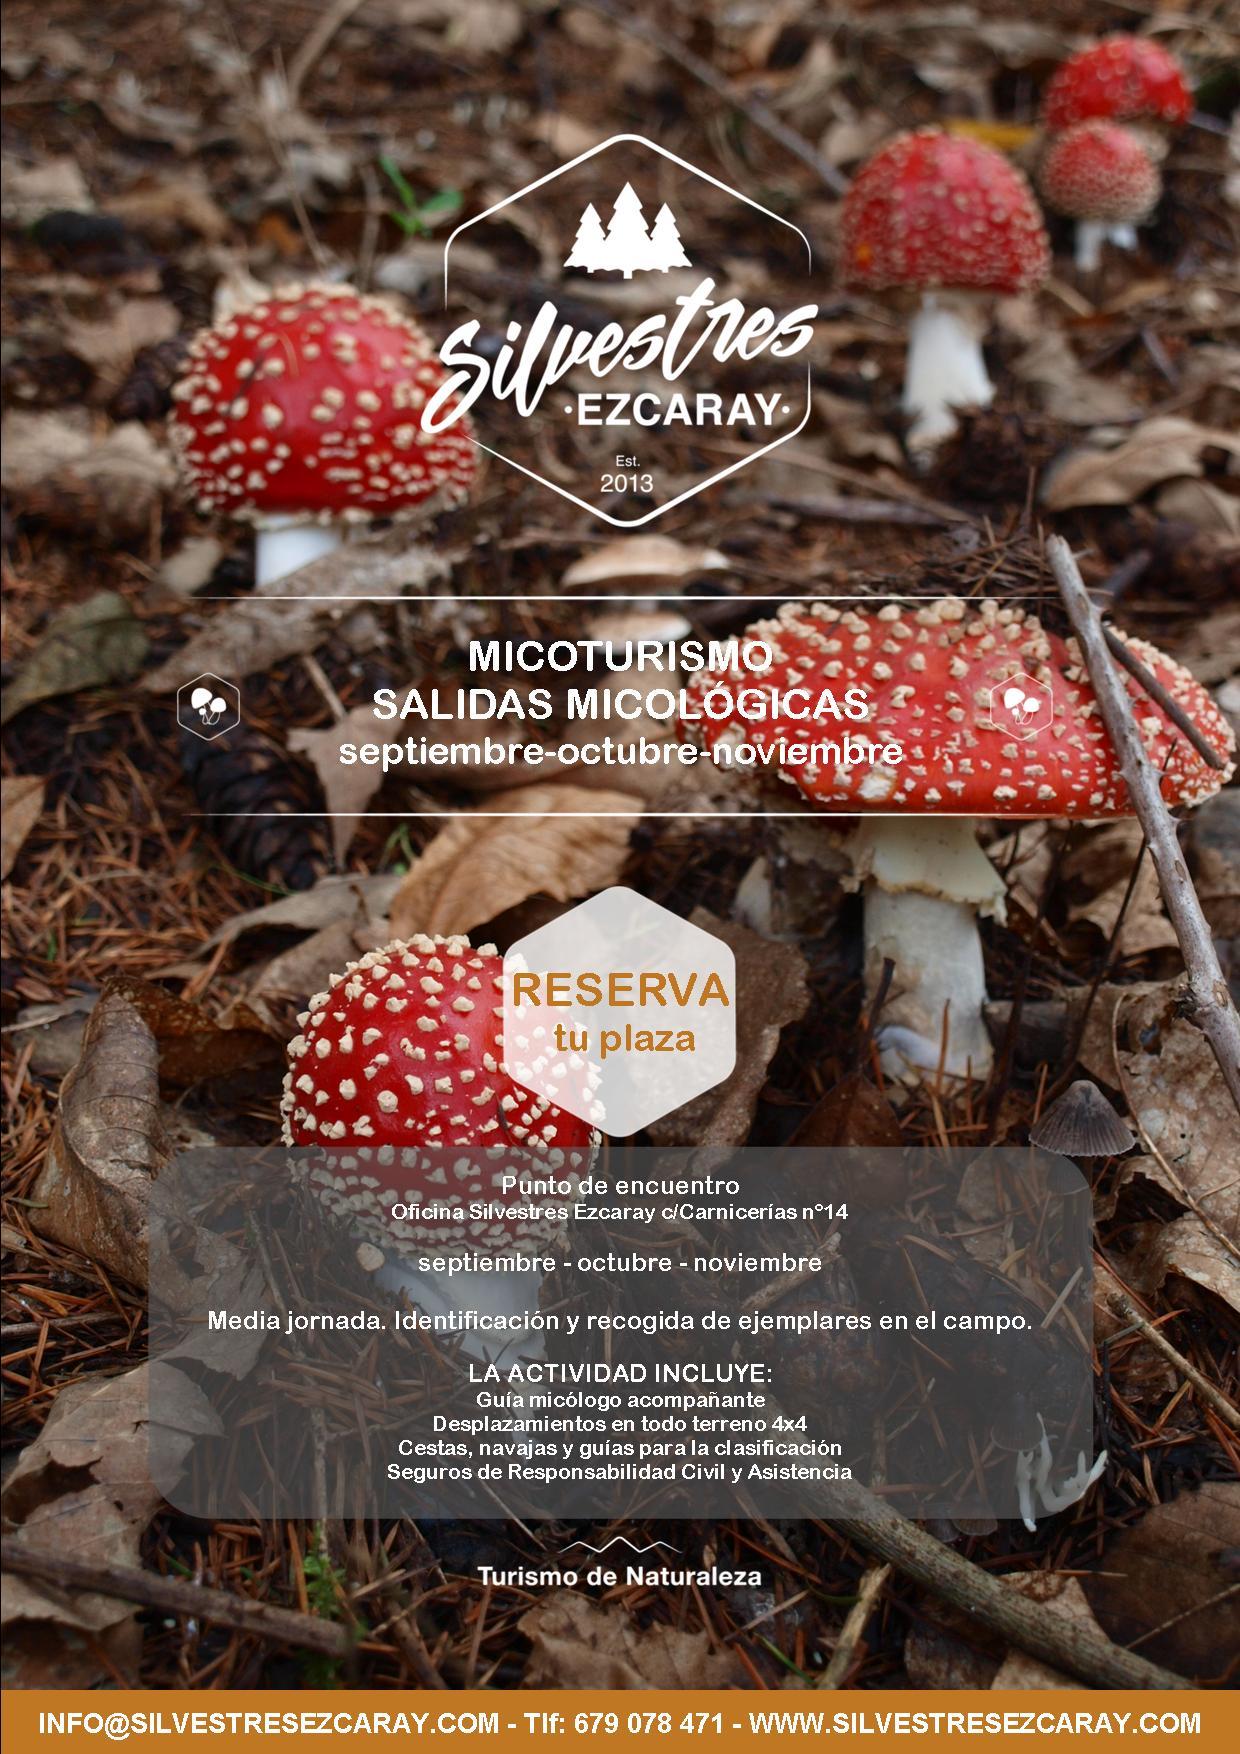 recoger_setas_hongos_boletus_ezcaray_la_rioja_turismo_otoño_alojamientos_jornadas_micológicas